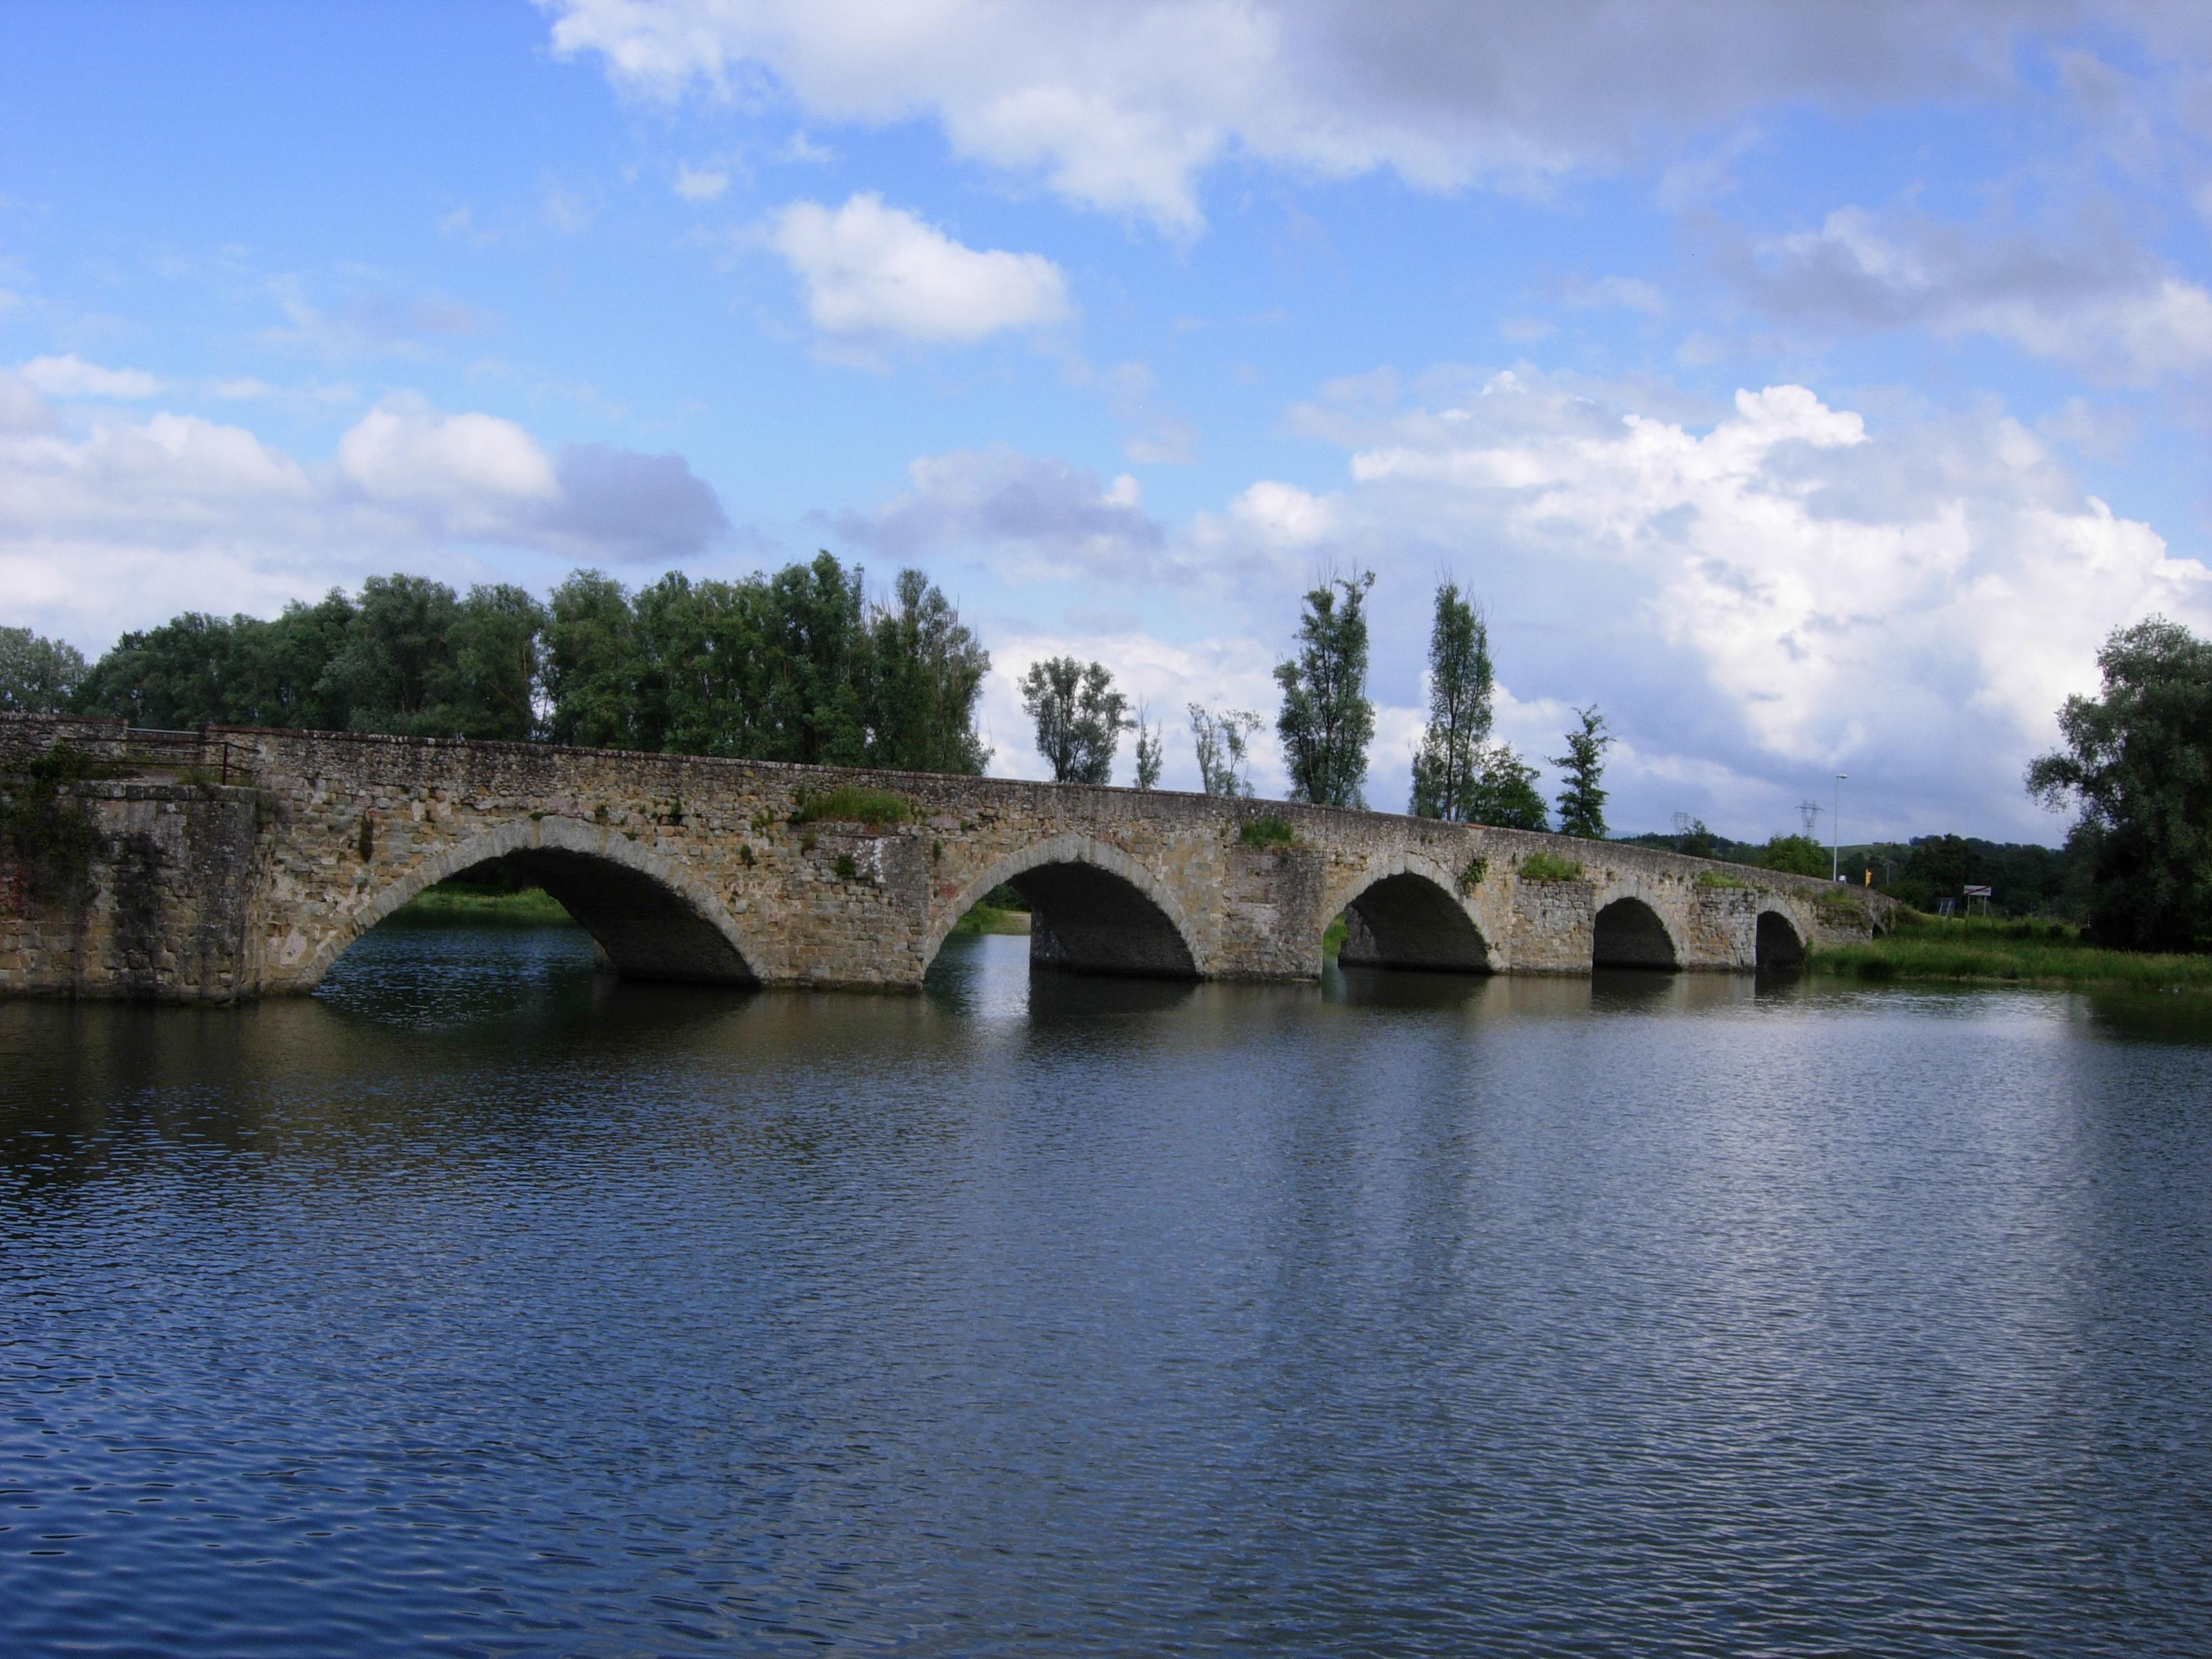 File:Ponte Buriano.jpg - Wikimedia Commons Da Vinci Mona Lisa